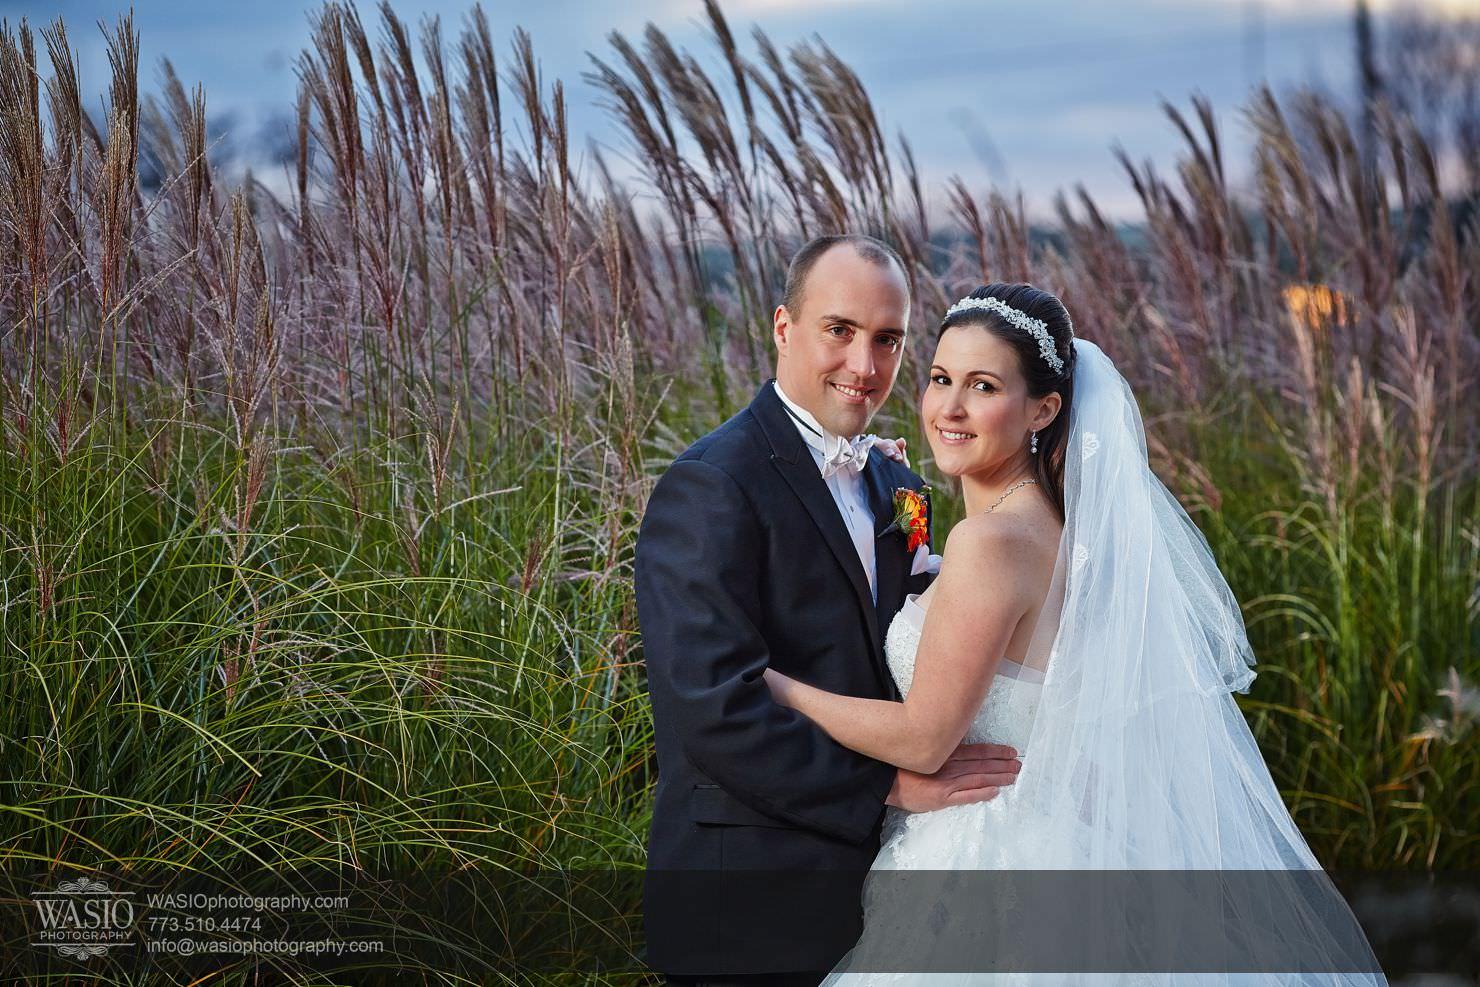 Rosemont-Fall-Wedding-Lauren-and-David-017 Rosemont Fall Wedding - Lauren + David